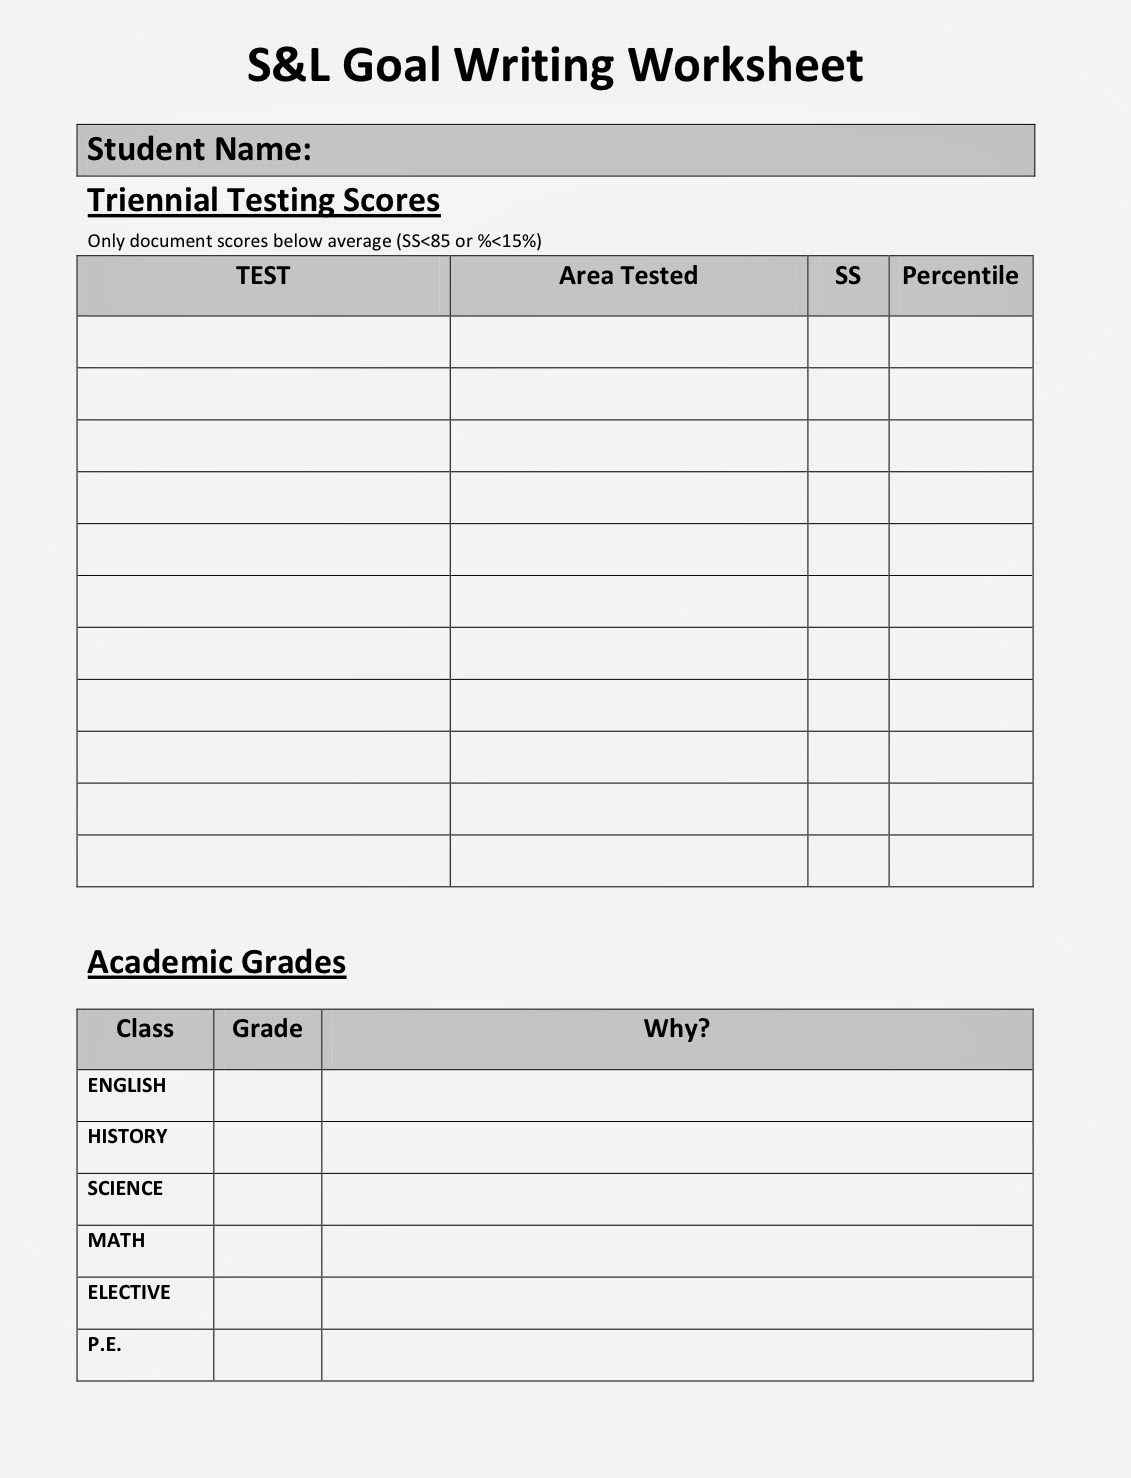 Goal Writing Worksheet 1 1 131 1 478 Pixels